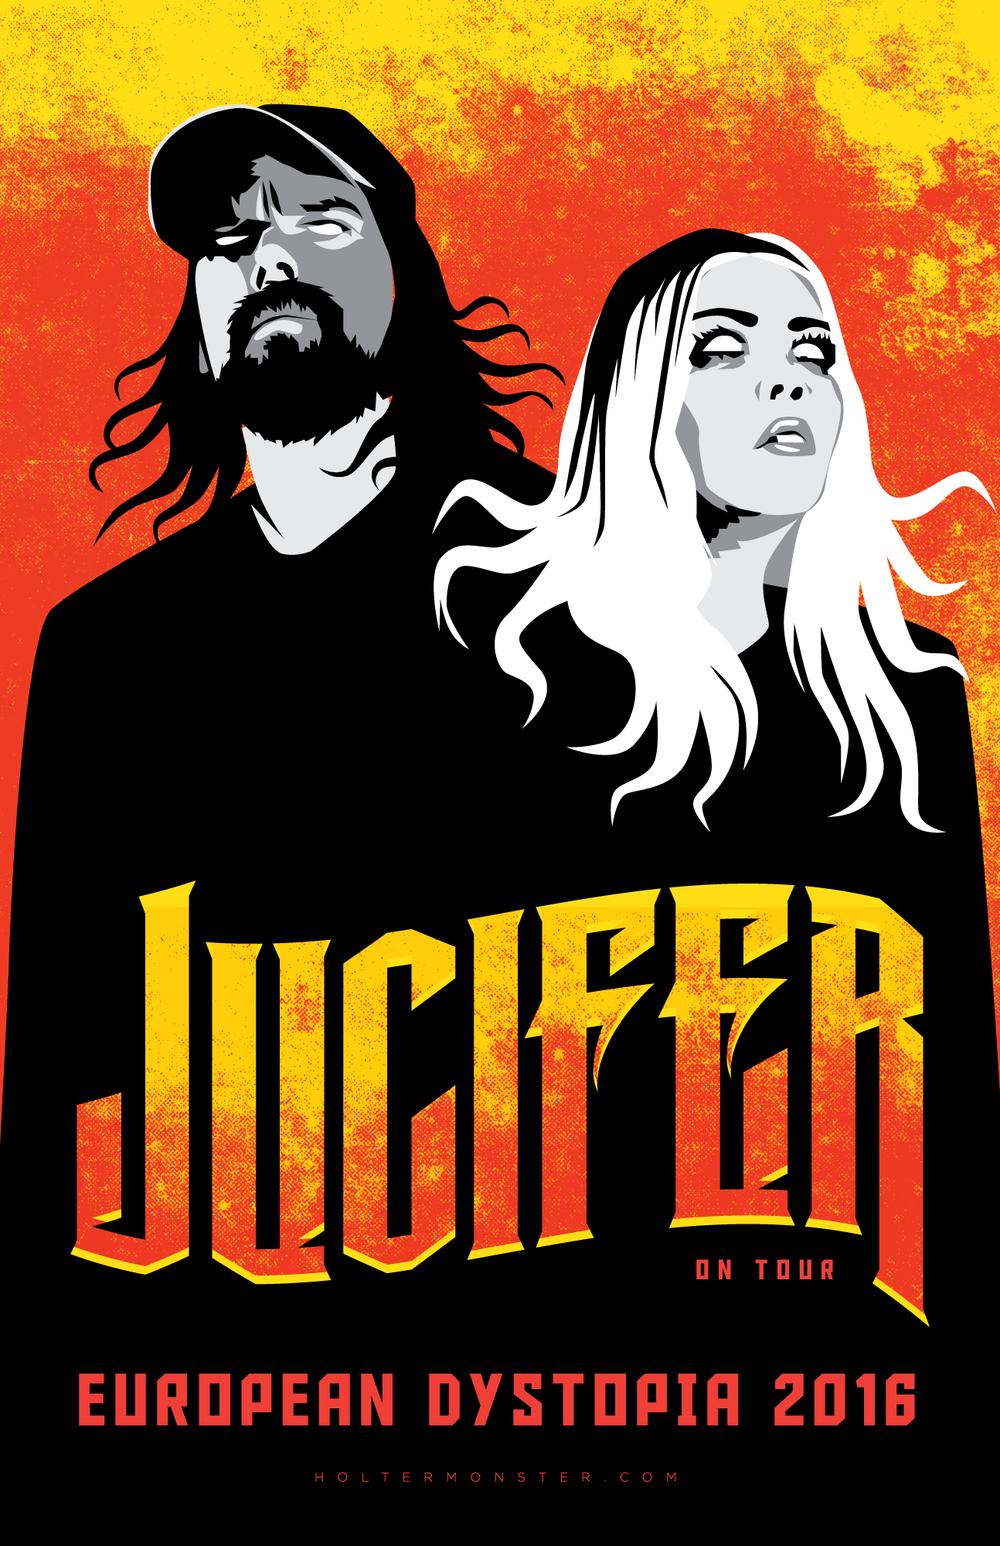 Jucifer_euro-tour_web.png